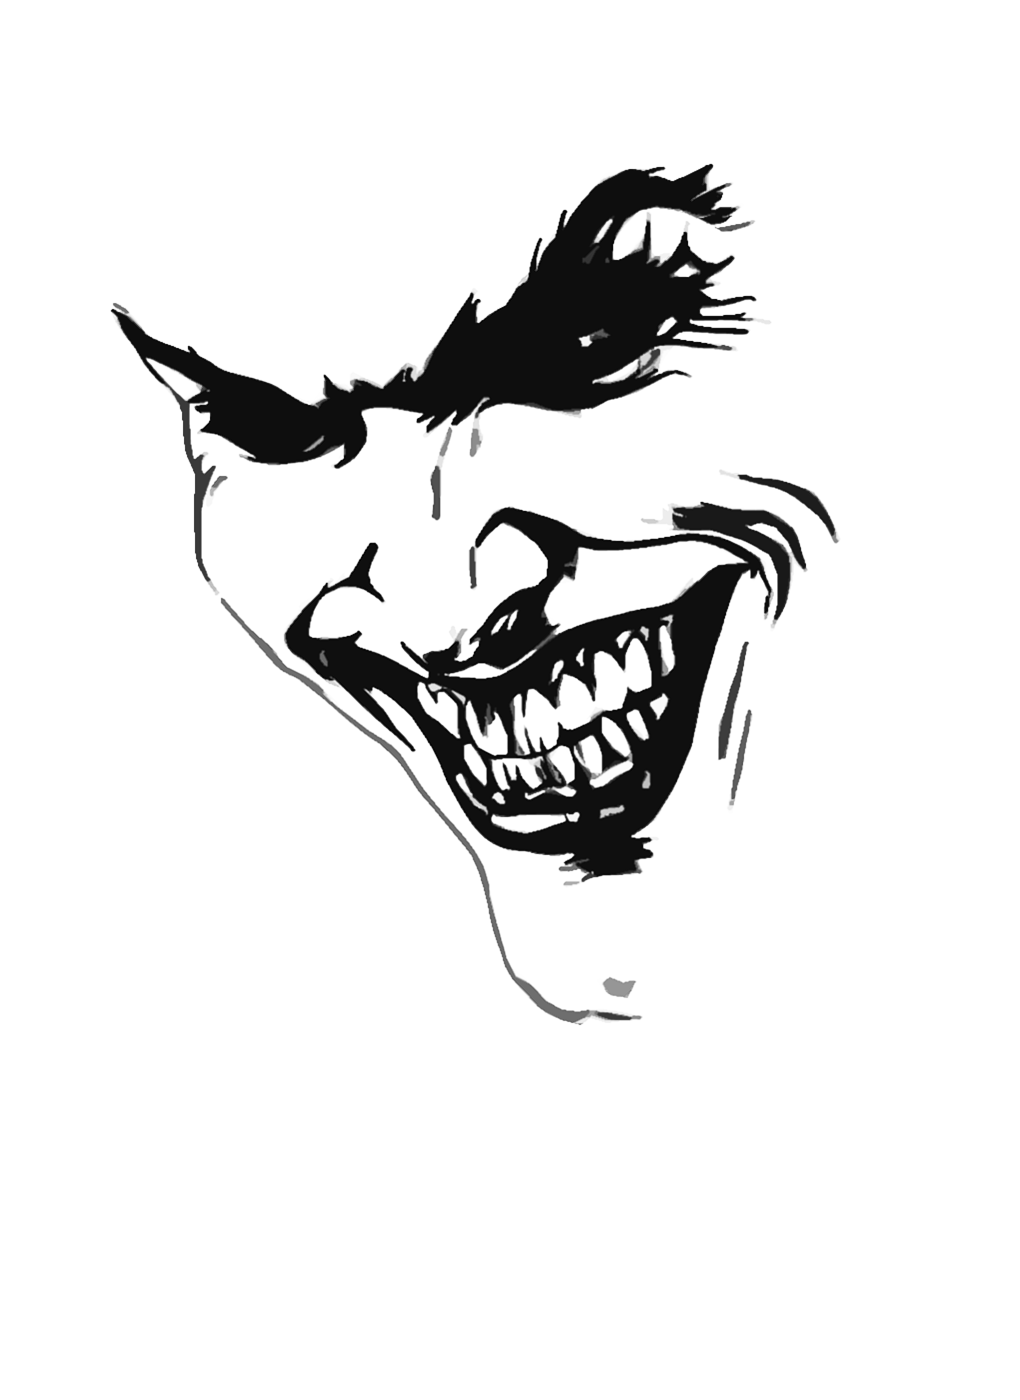 Pin By Vijay Vadhel On Studio Background Images Studio Background Images Art Joker Face